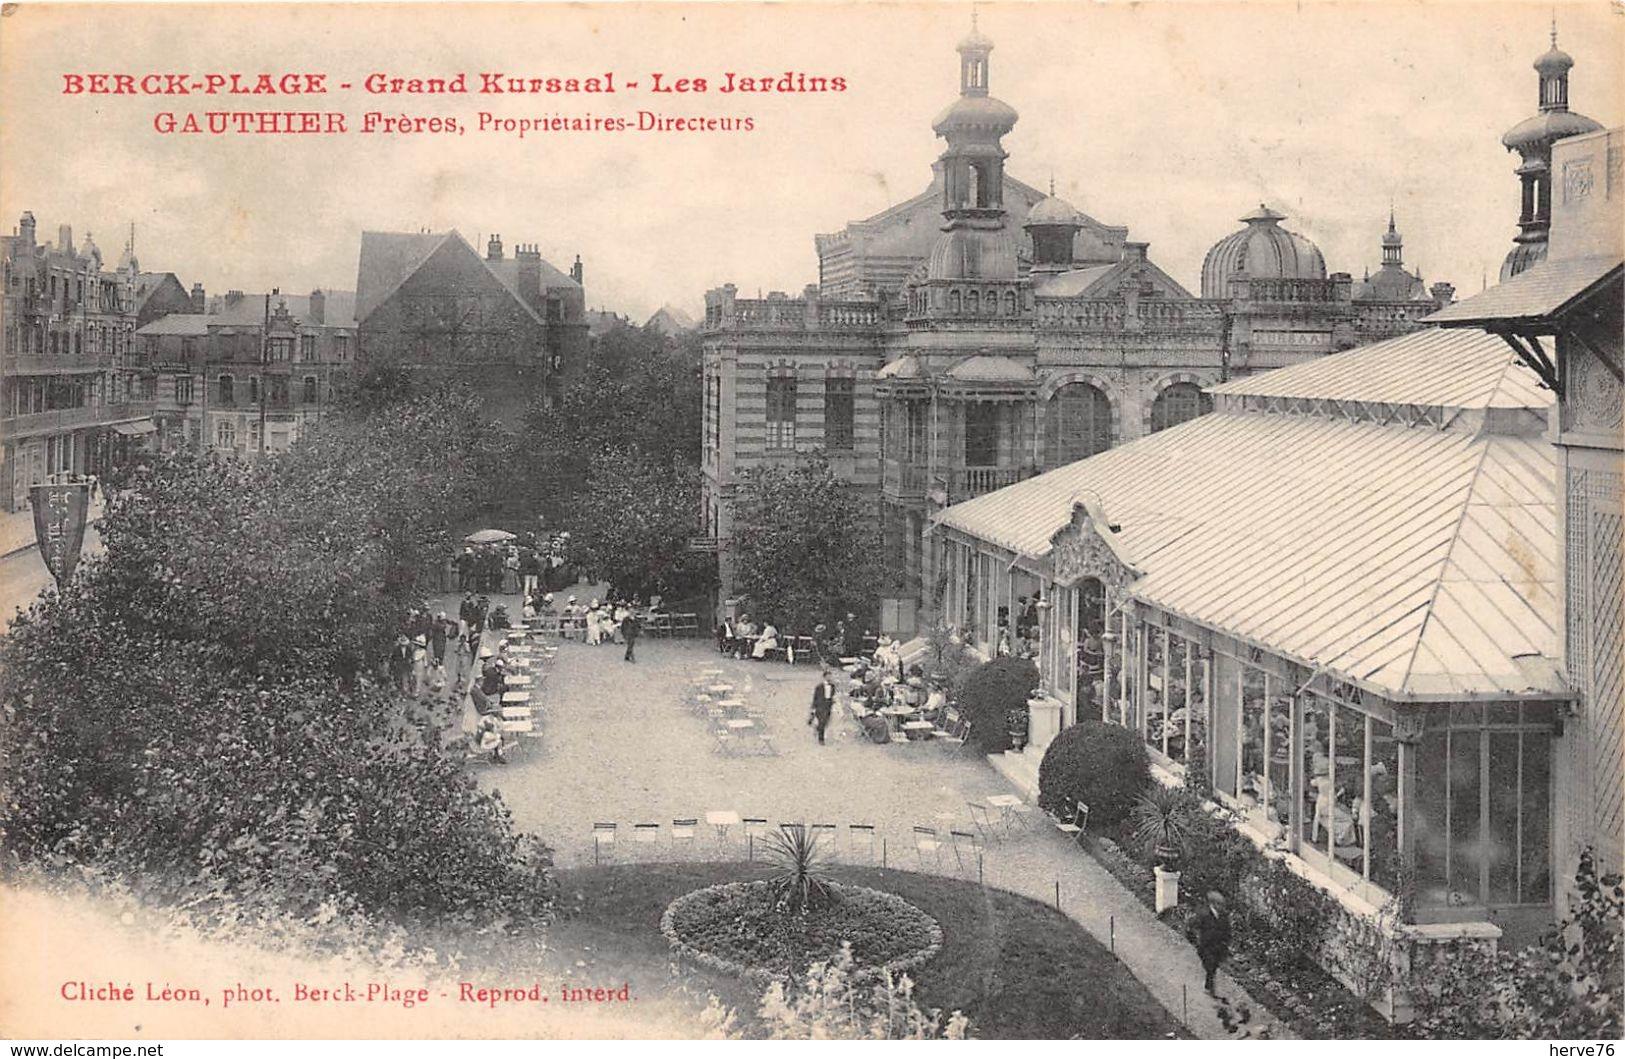 BERCK-PLAGE - Grand Kursaal - Les Jardins - GAUTHIER Frères, Propriétaires - Berck